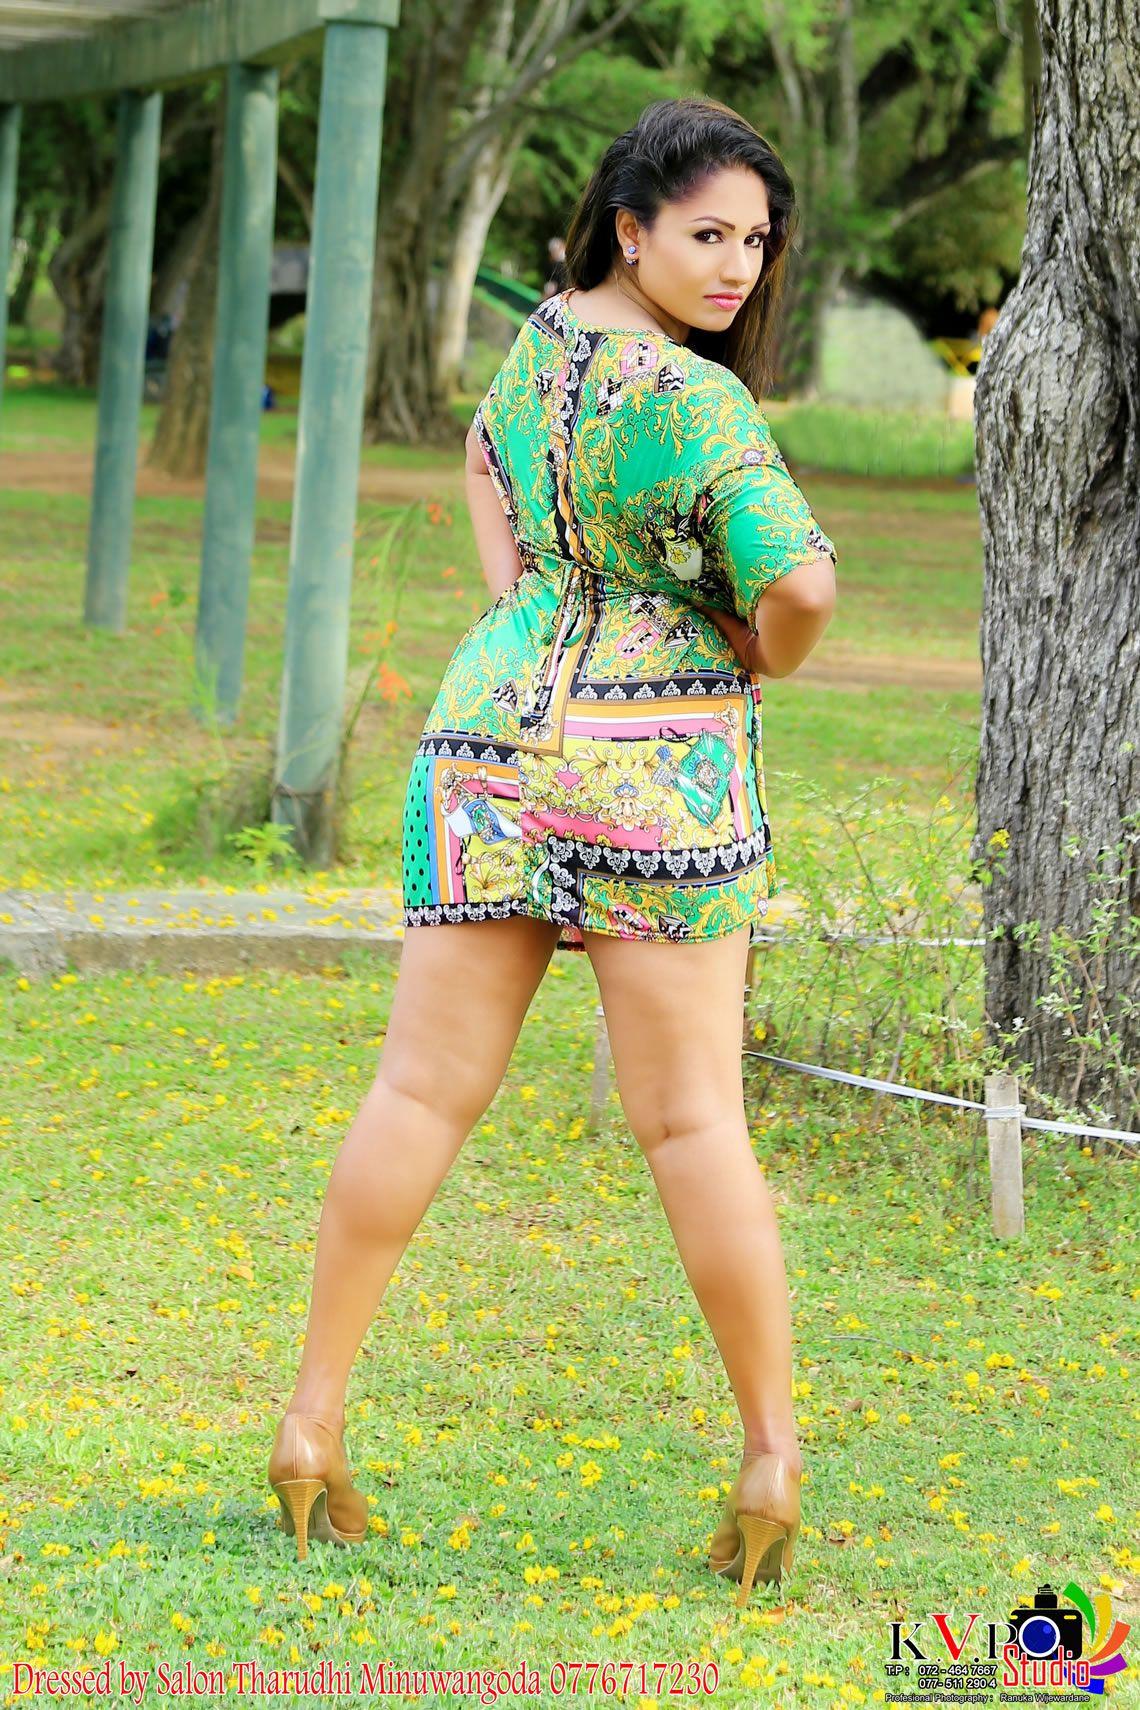 Srilankan teen girls-8165